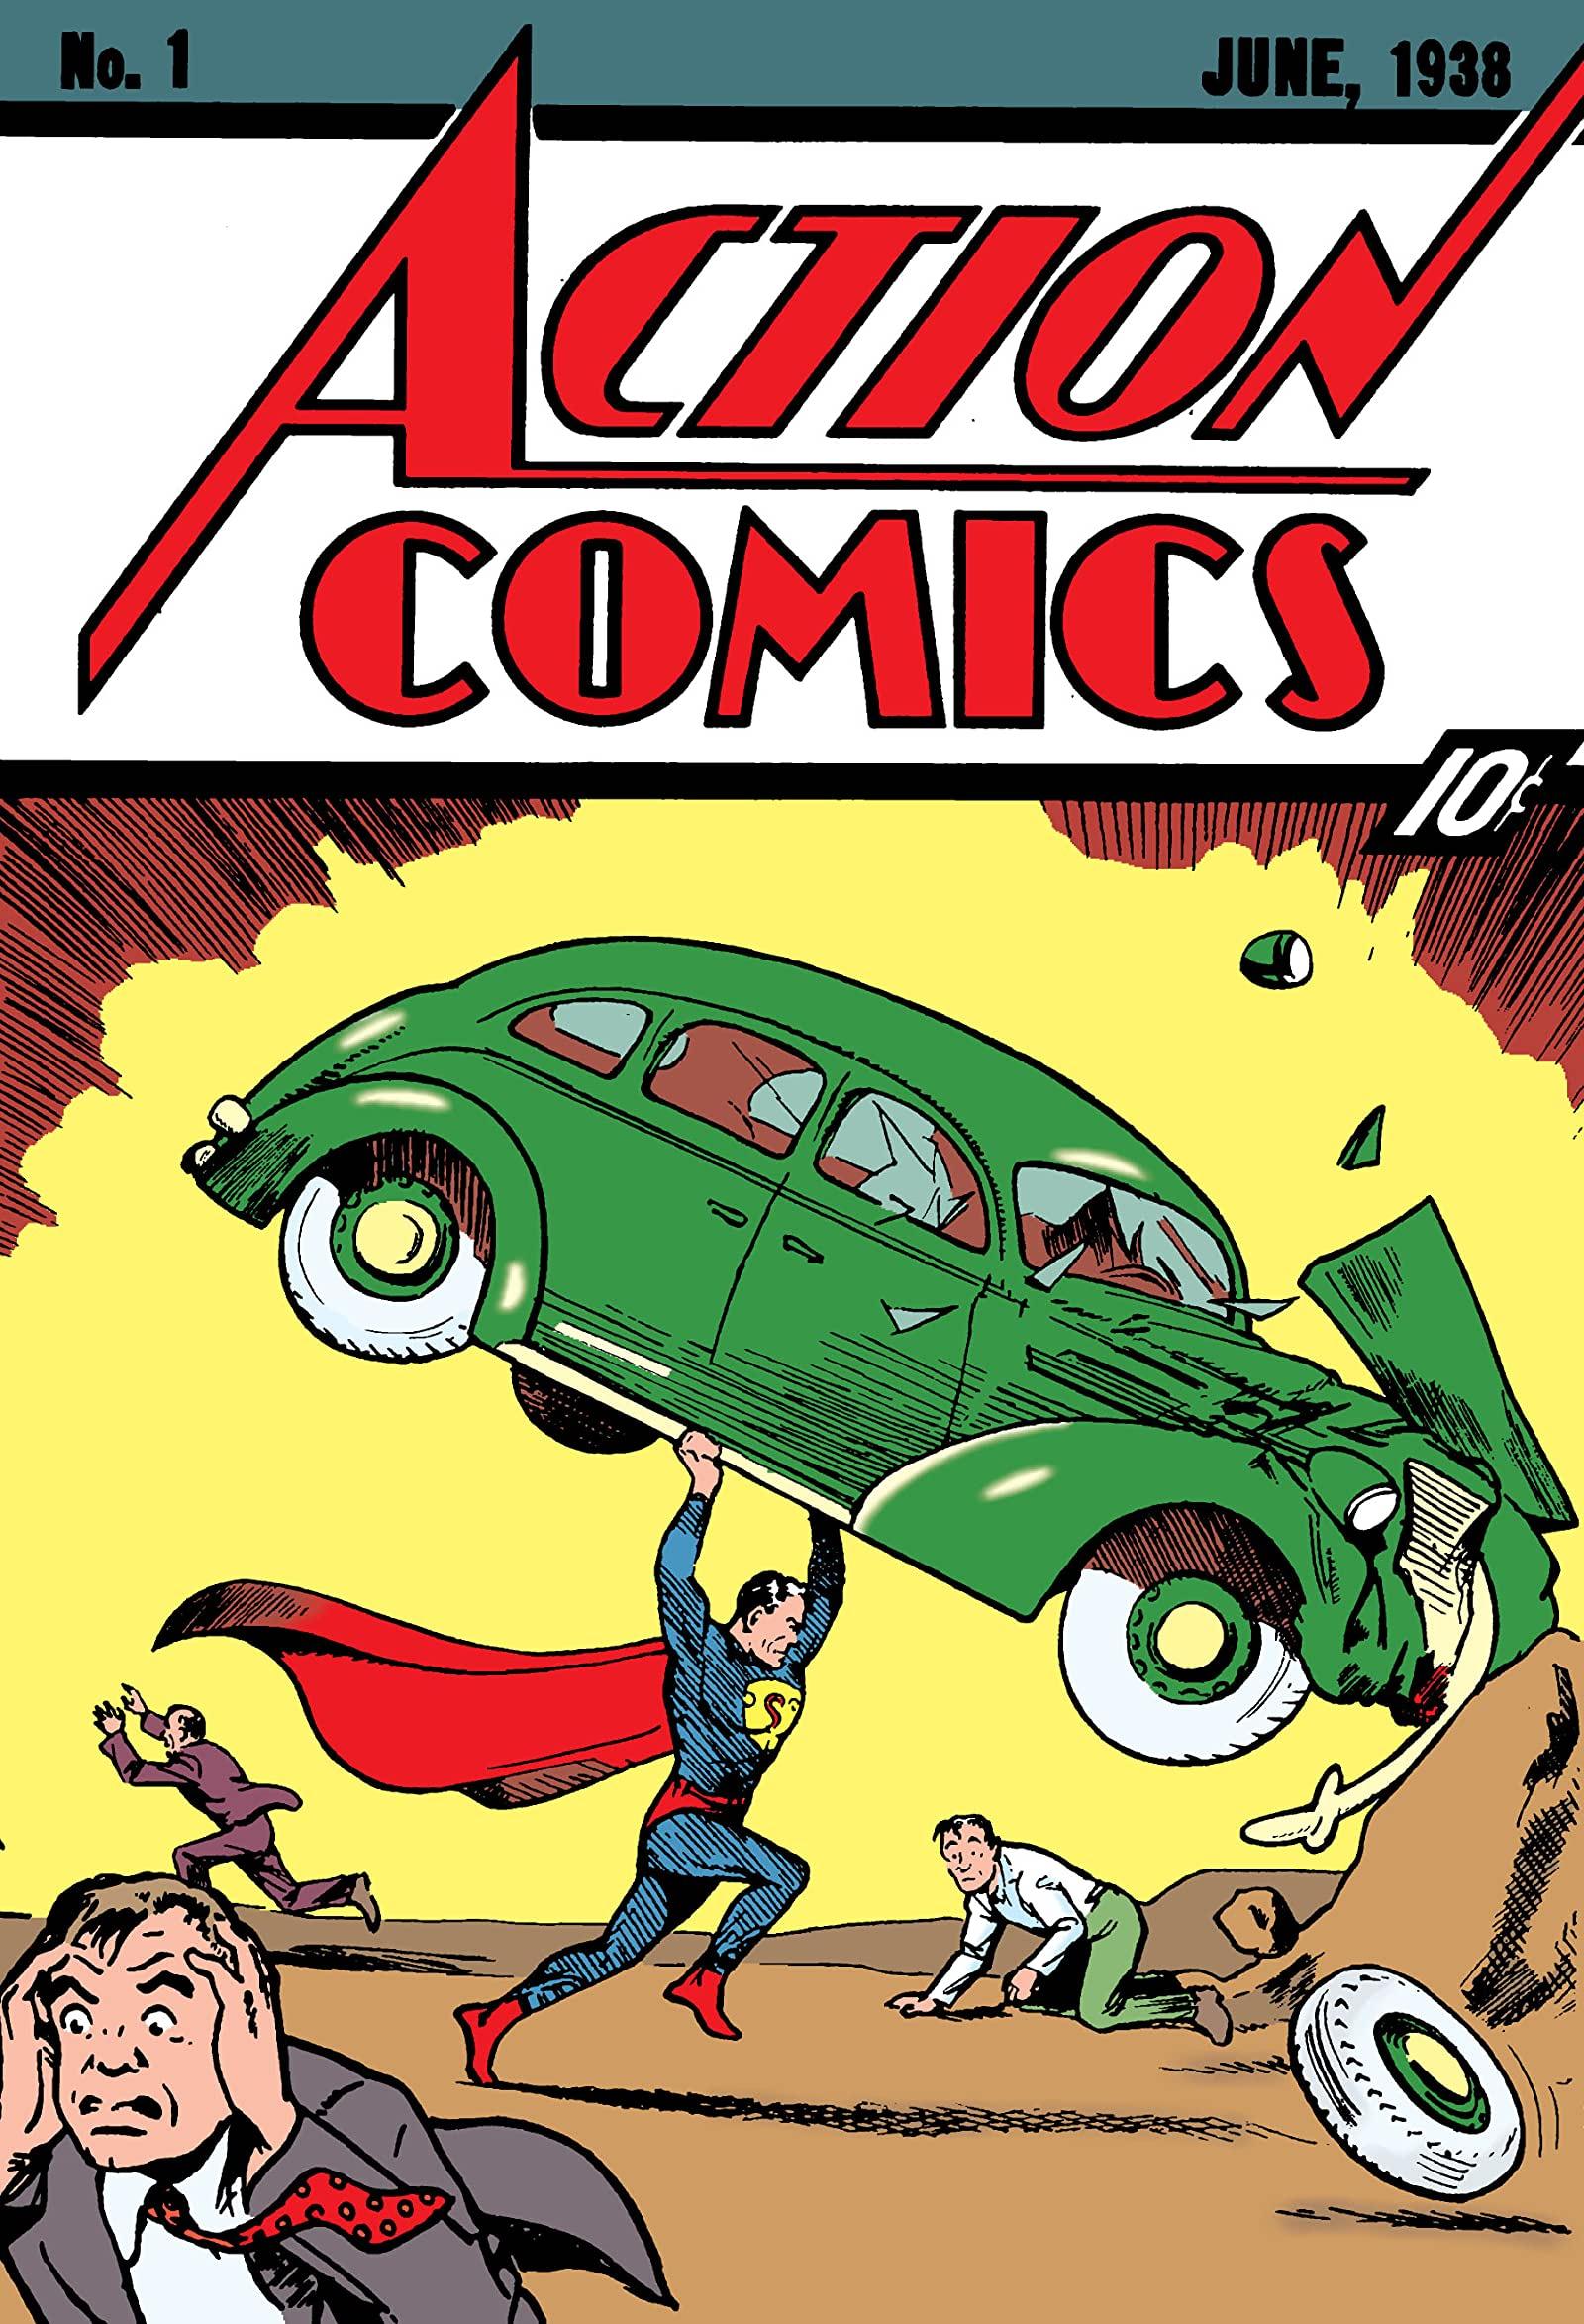 Action Comic #1